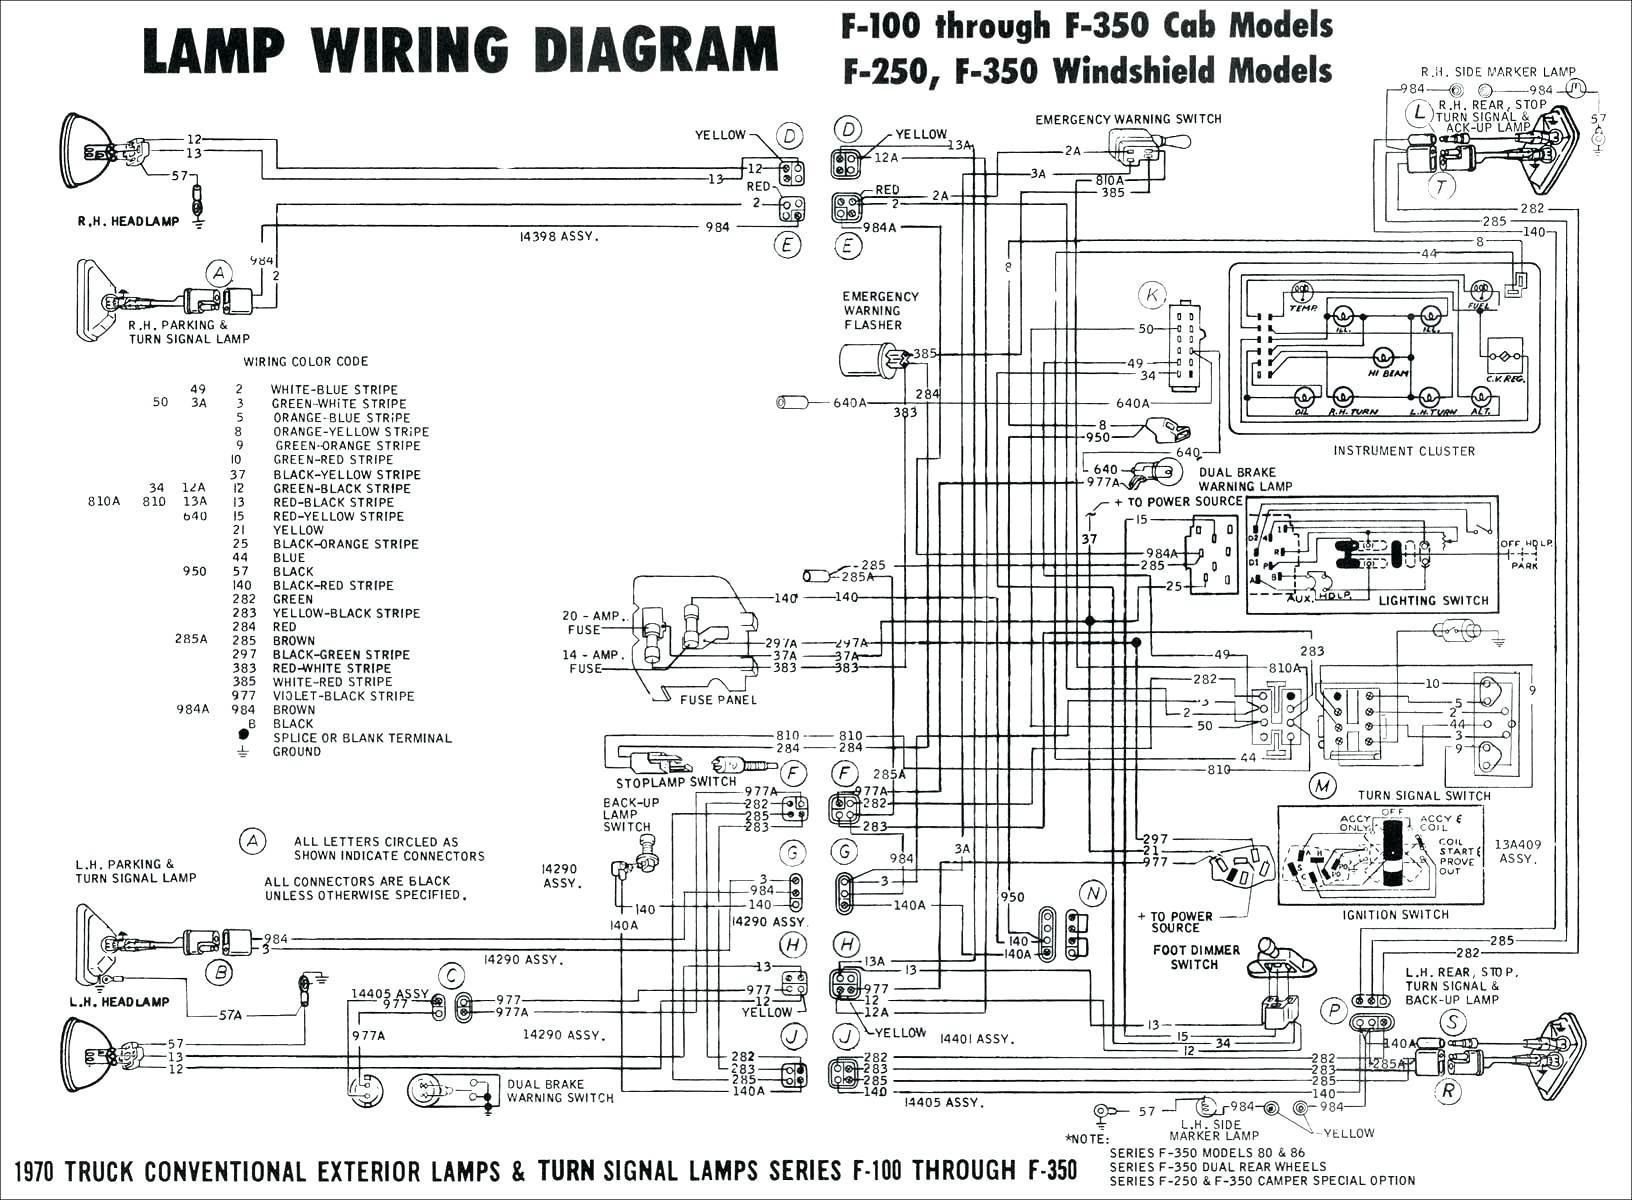 Honda Accord V6 Engine Diagram